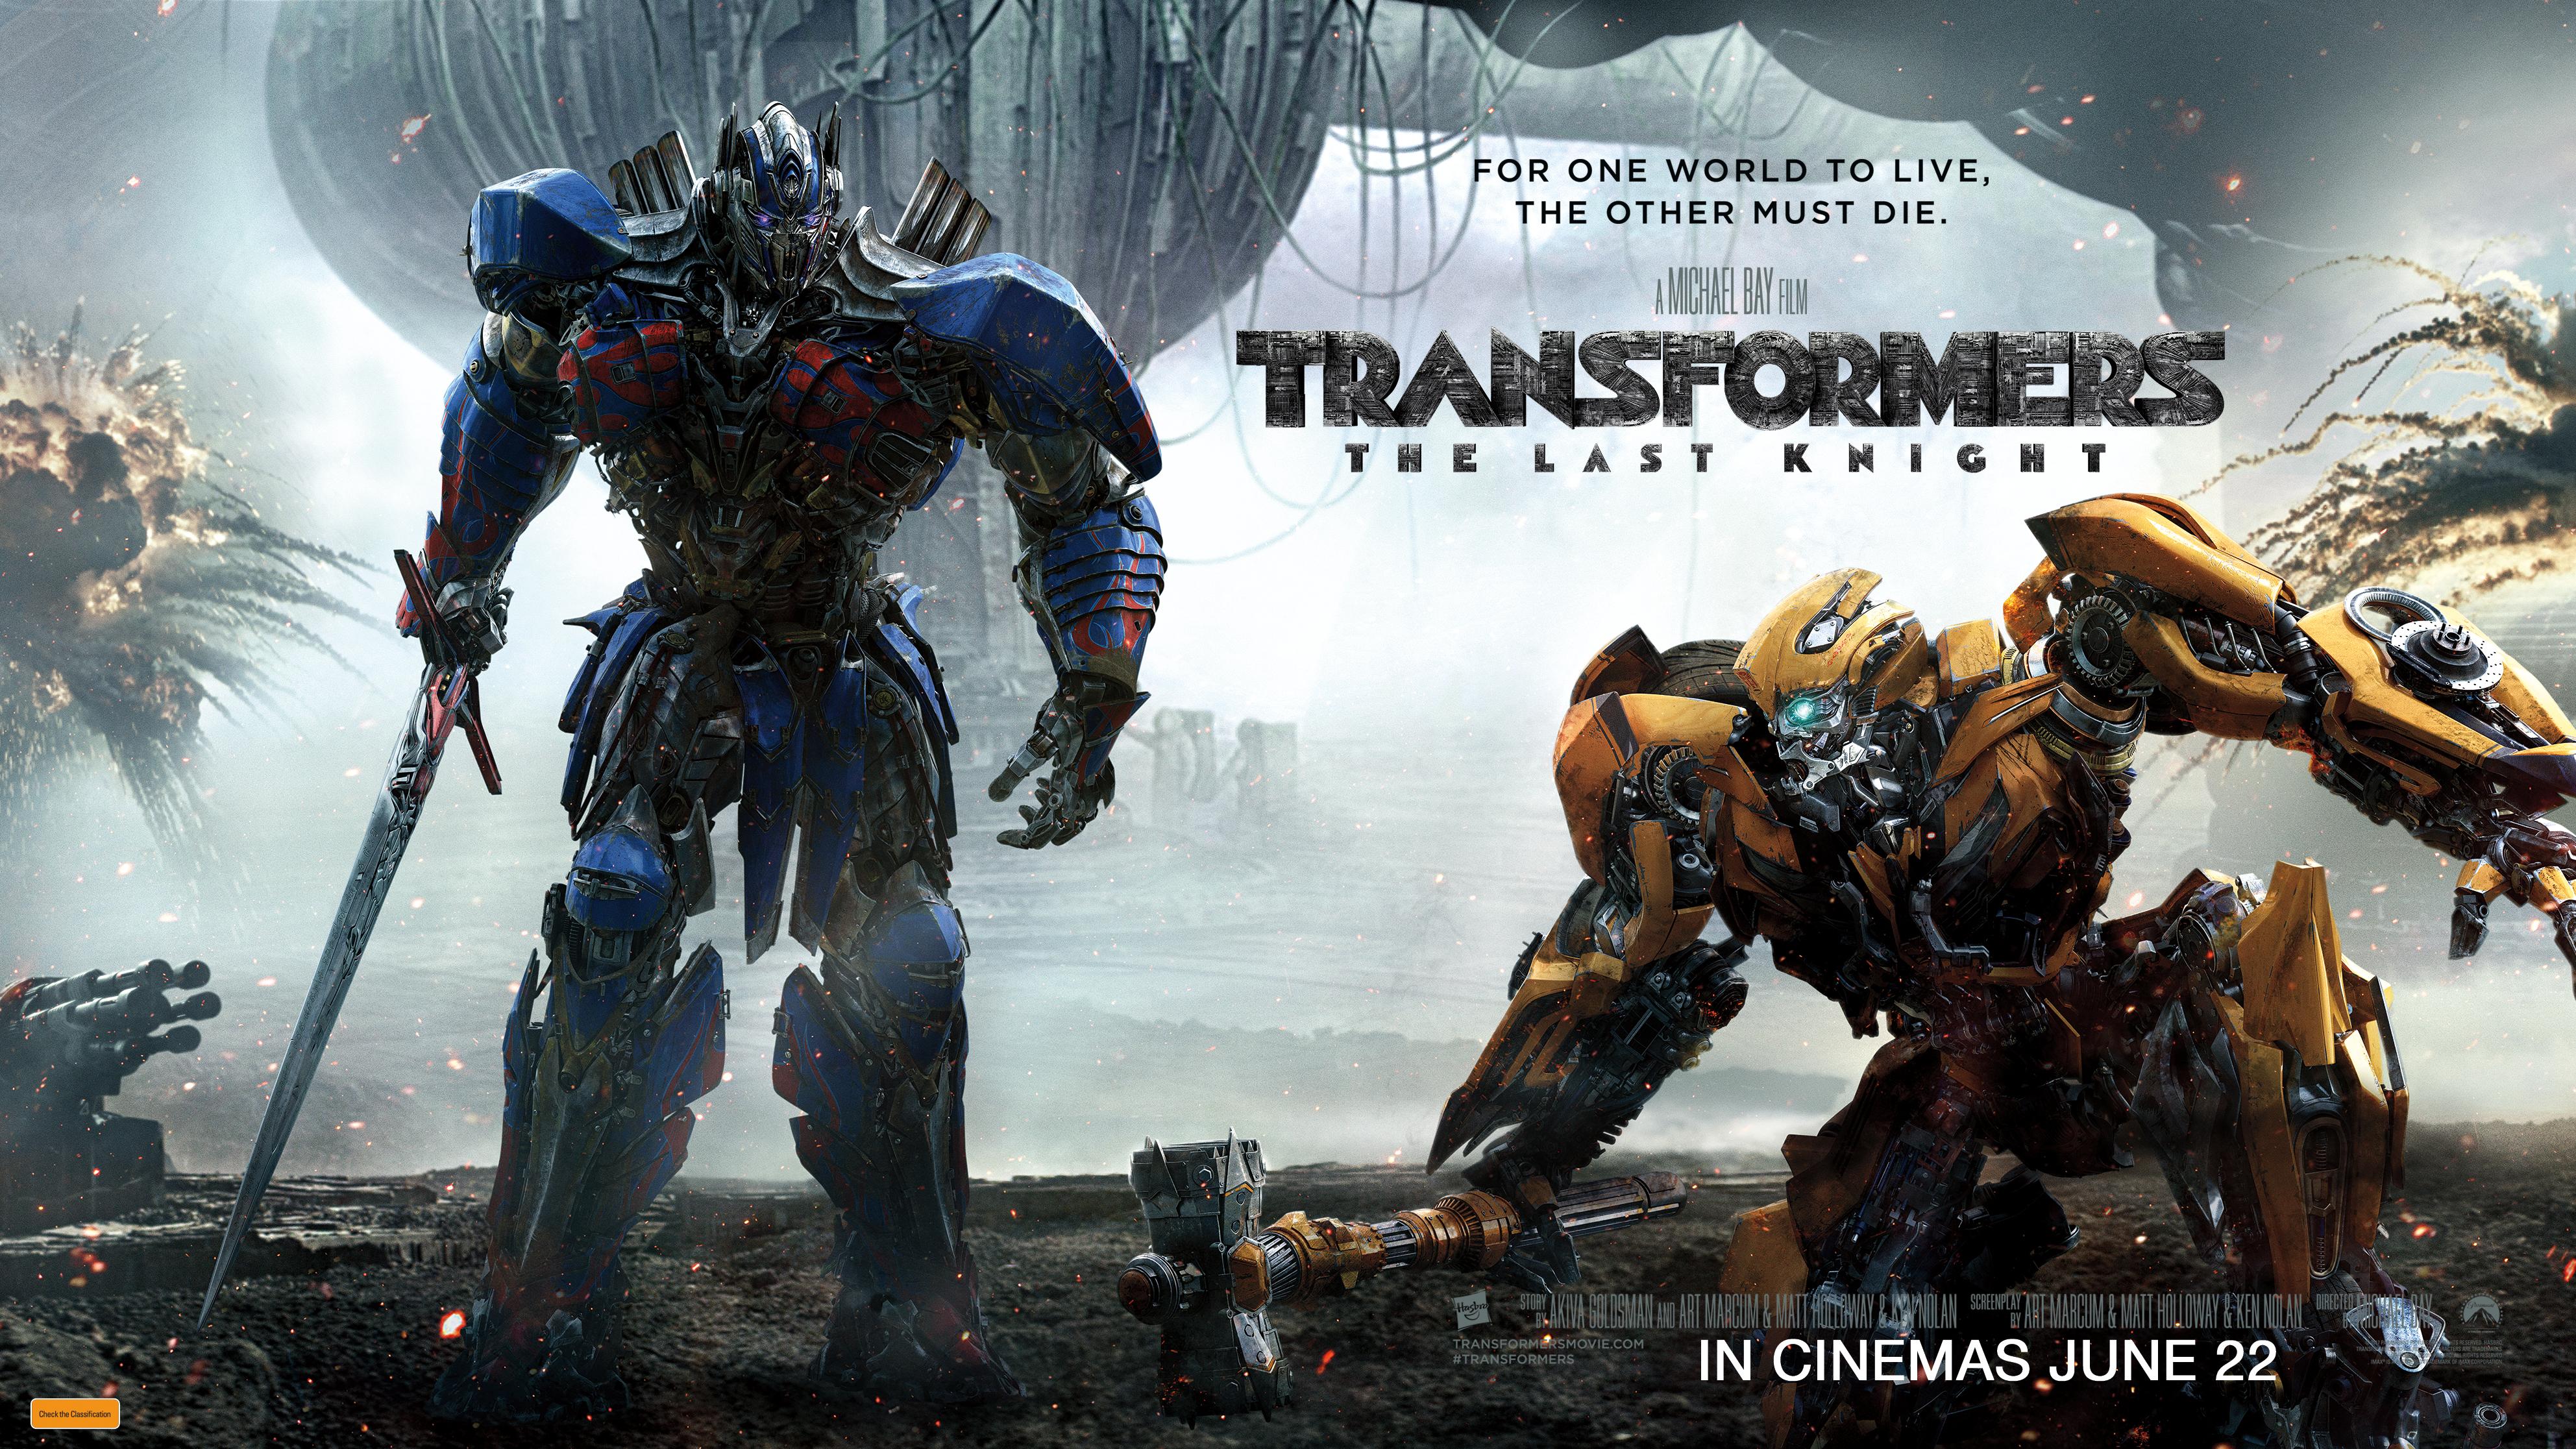 Optimus Prime vs Bumblebee